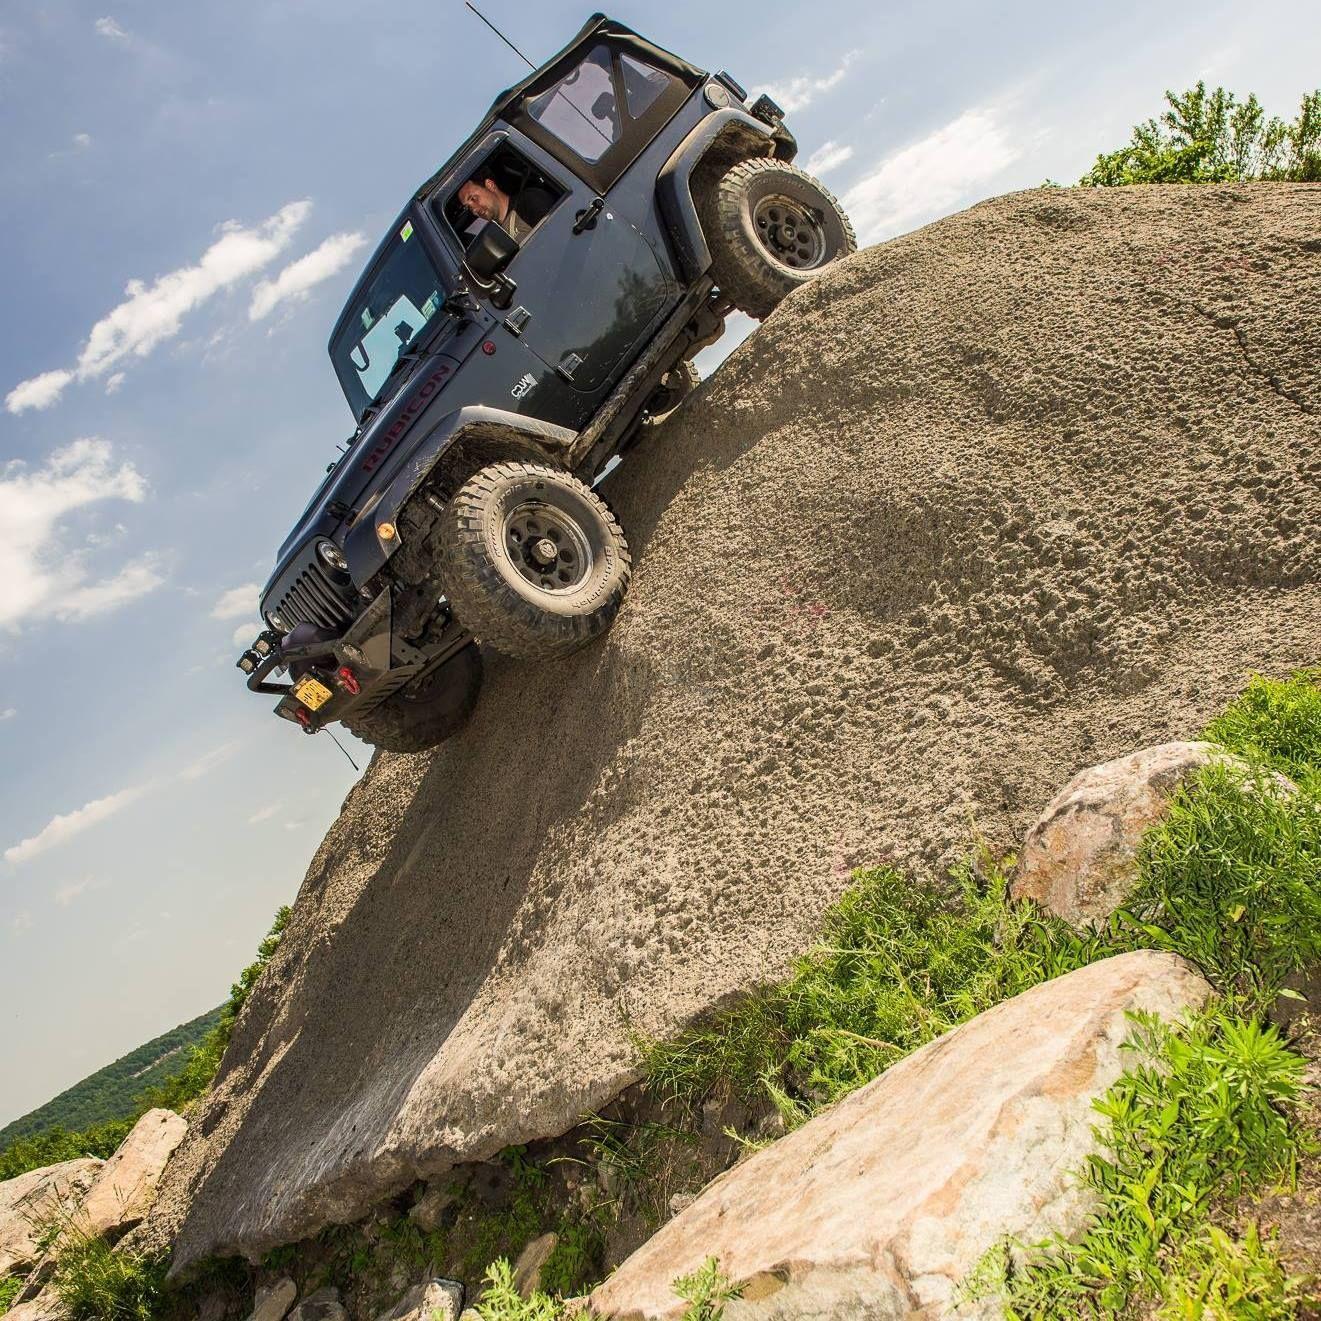 Capital District Jeep Wrangler (Schenectady, NY